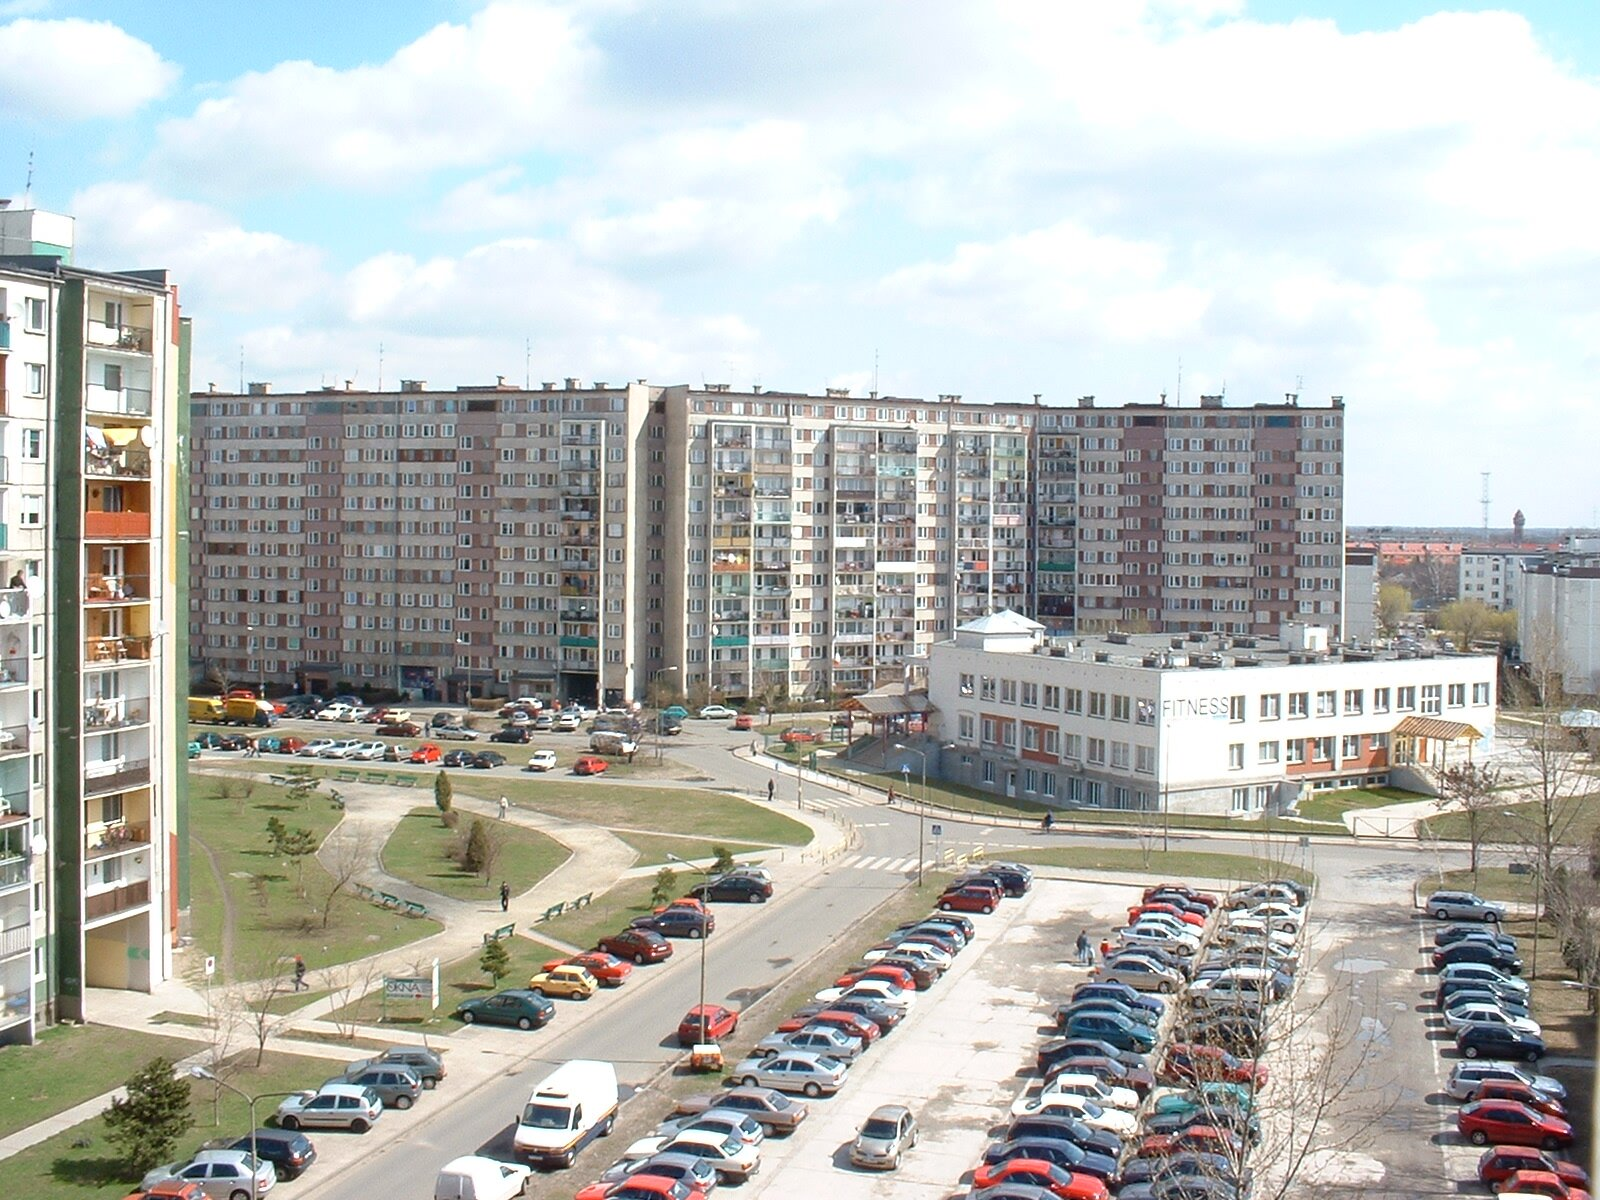 Osiedle Gaj we Wrocławiu Osiedle Gaj we Wrocławiu Źródło: Shaqspeare, Wikimedia Commons, licencja: CC BY-SA 2.5.